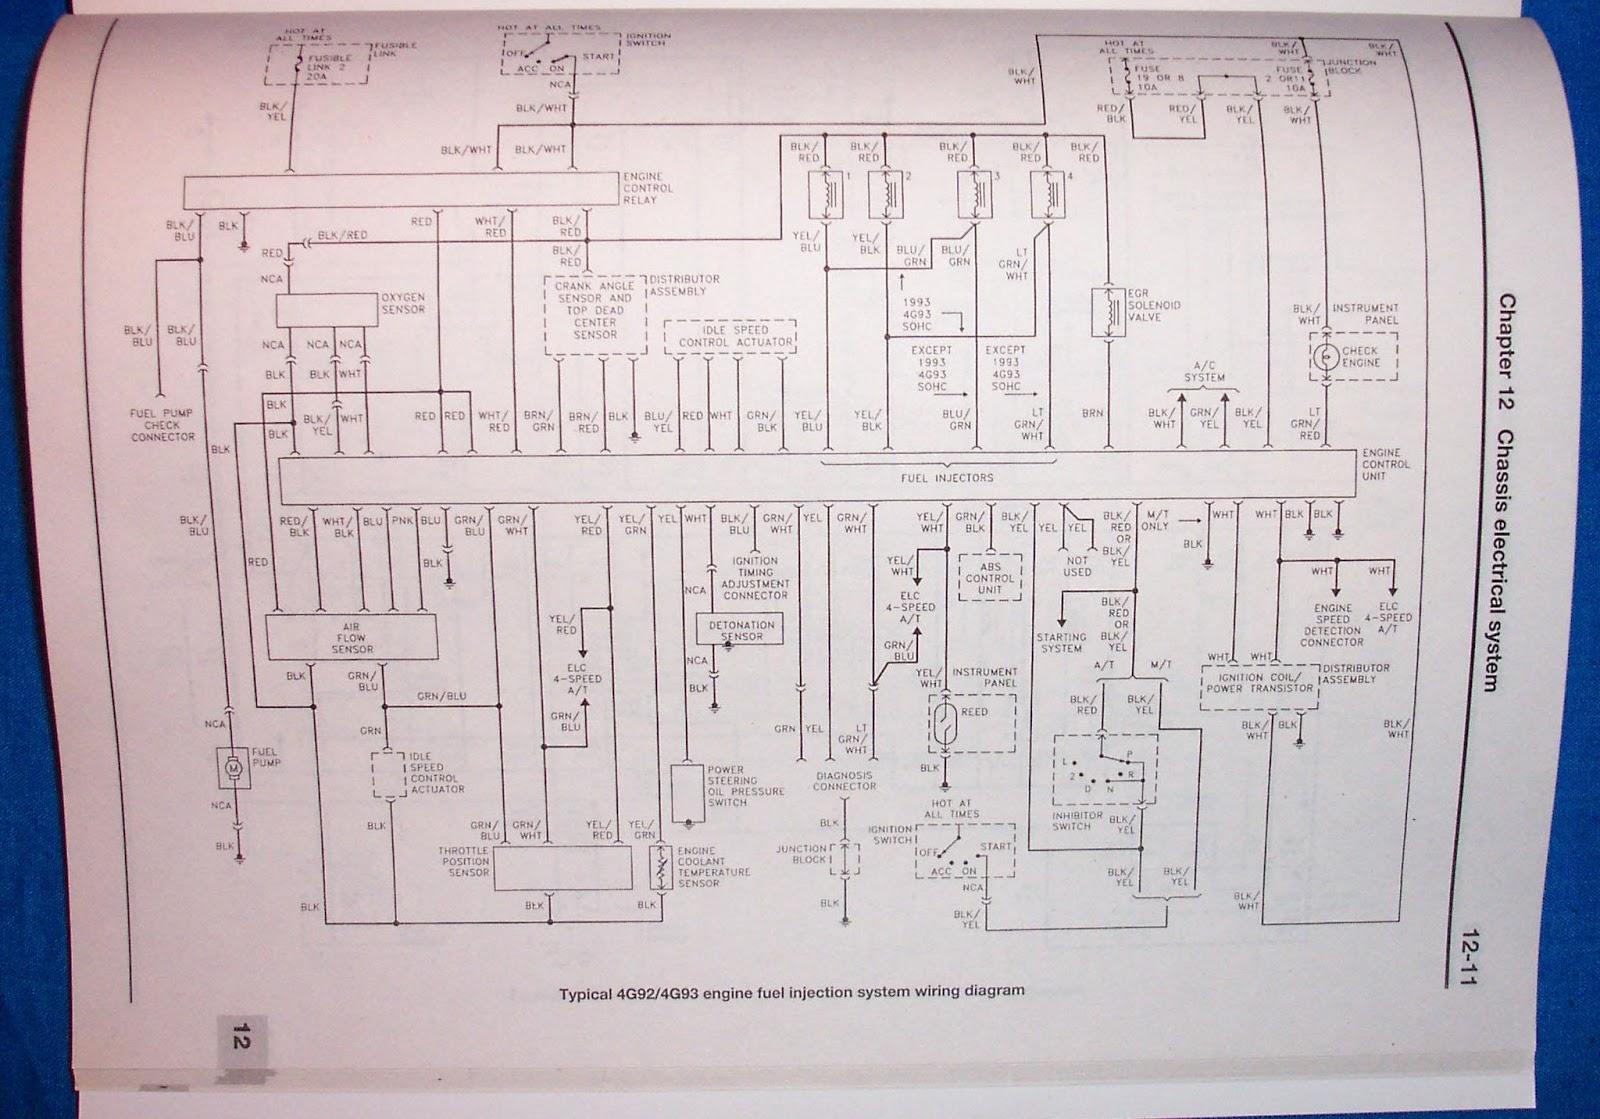 Engine Diagram On 2000 Mitsubishi Eclipse Gs Fuel Pump Wiring Diagram